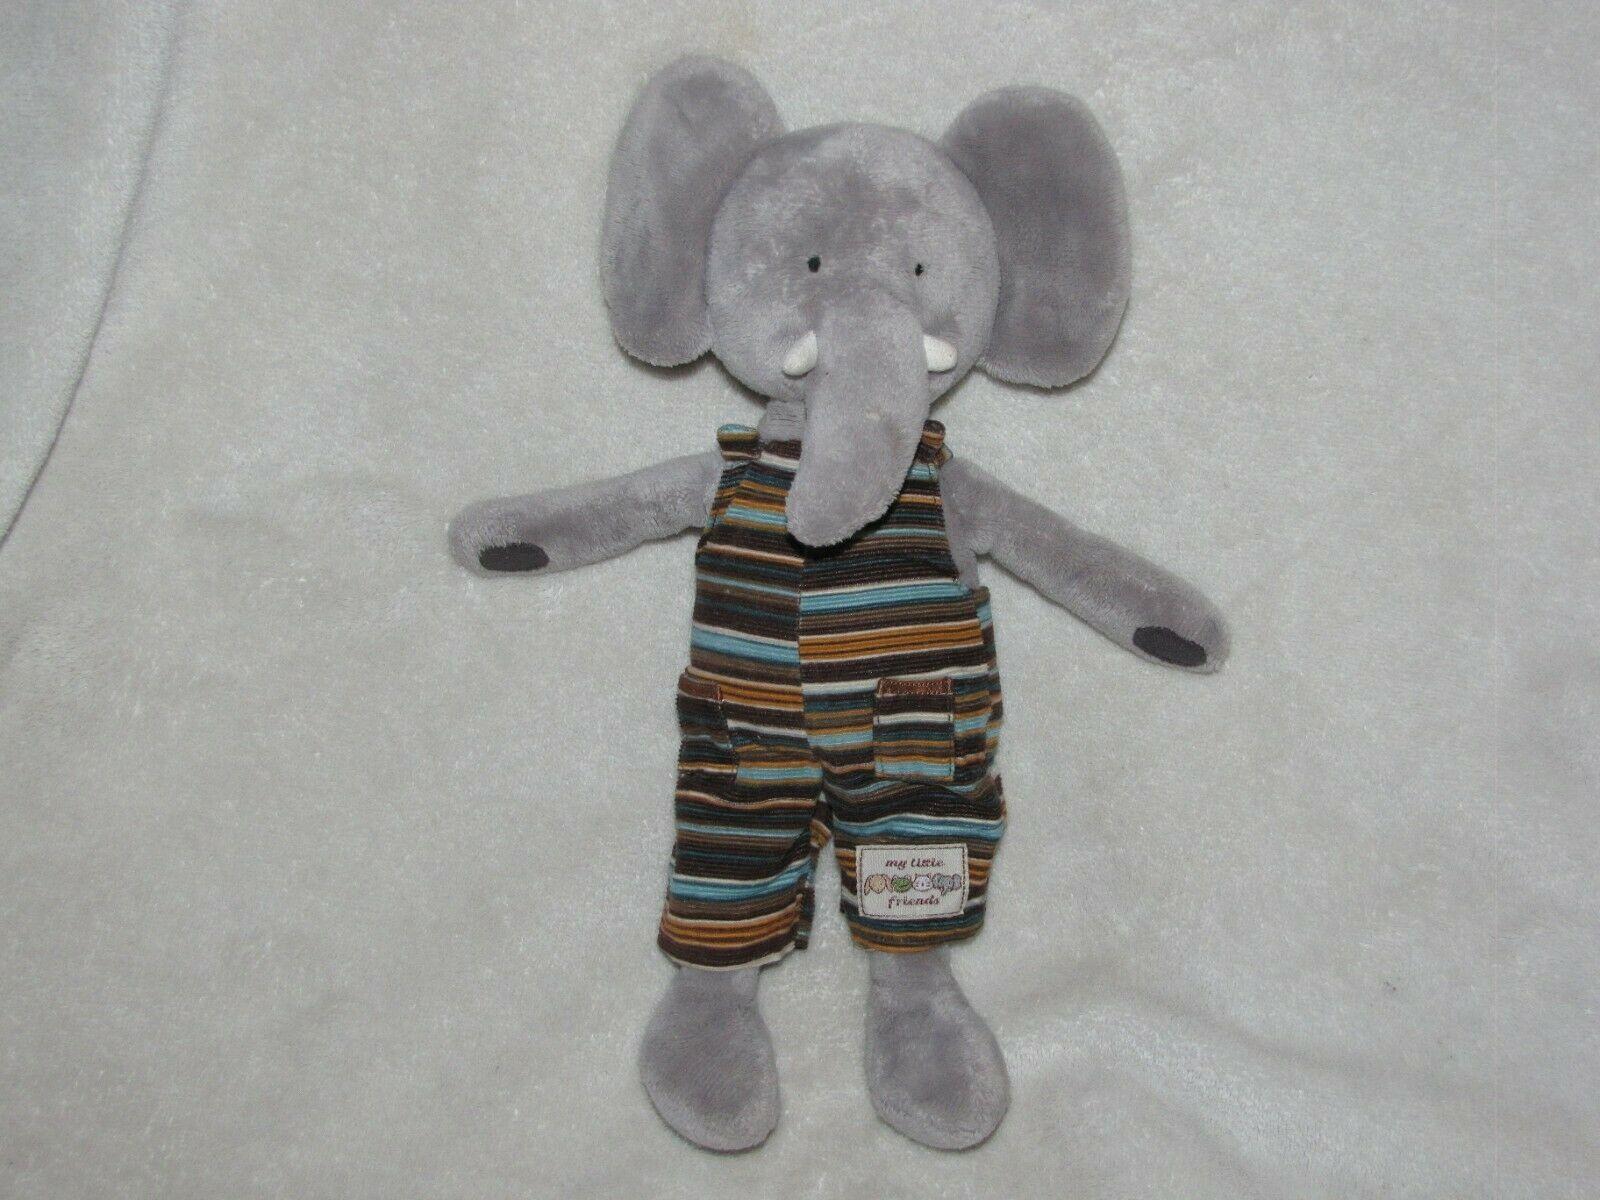 JELLY KITTEN MY LITTLE FRIENDS ELEPHANT SOFT TOY DUNGAREES JELLYCAT GRAY STRIPE - $69.29